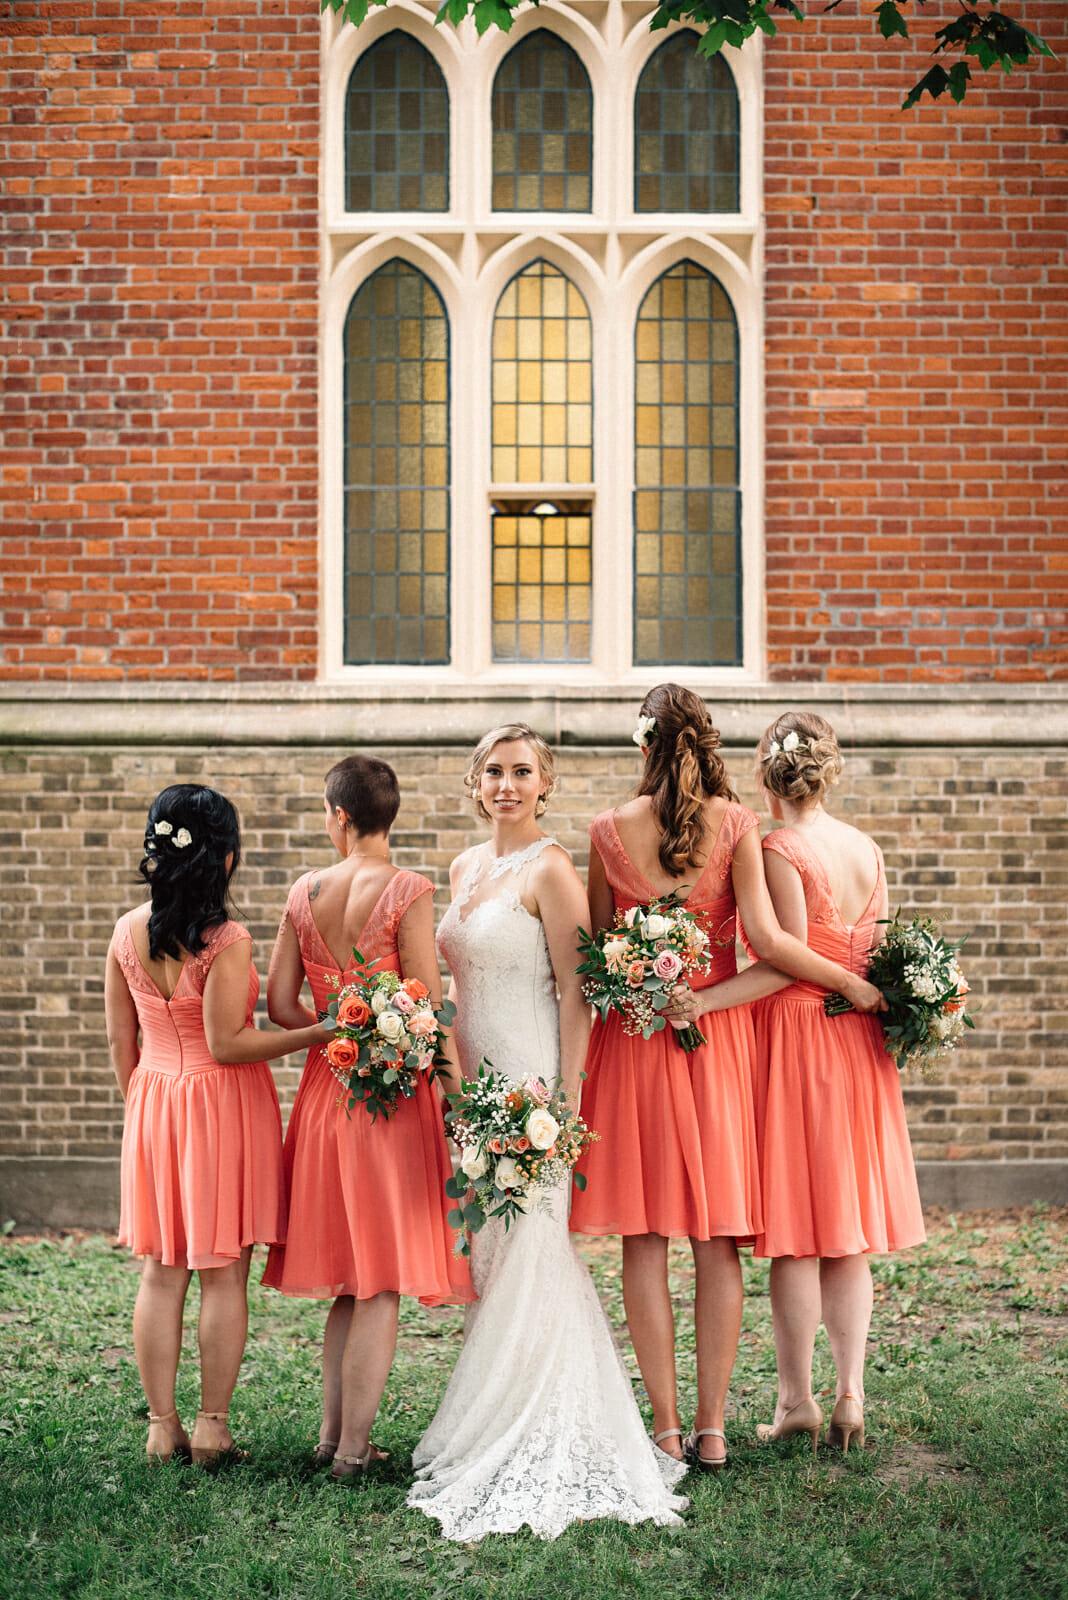 bridal party photos at enoch turner schoolhouse